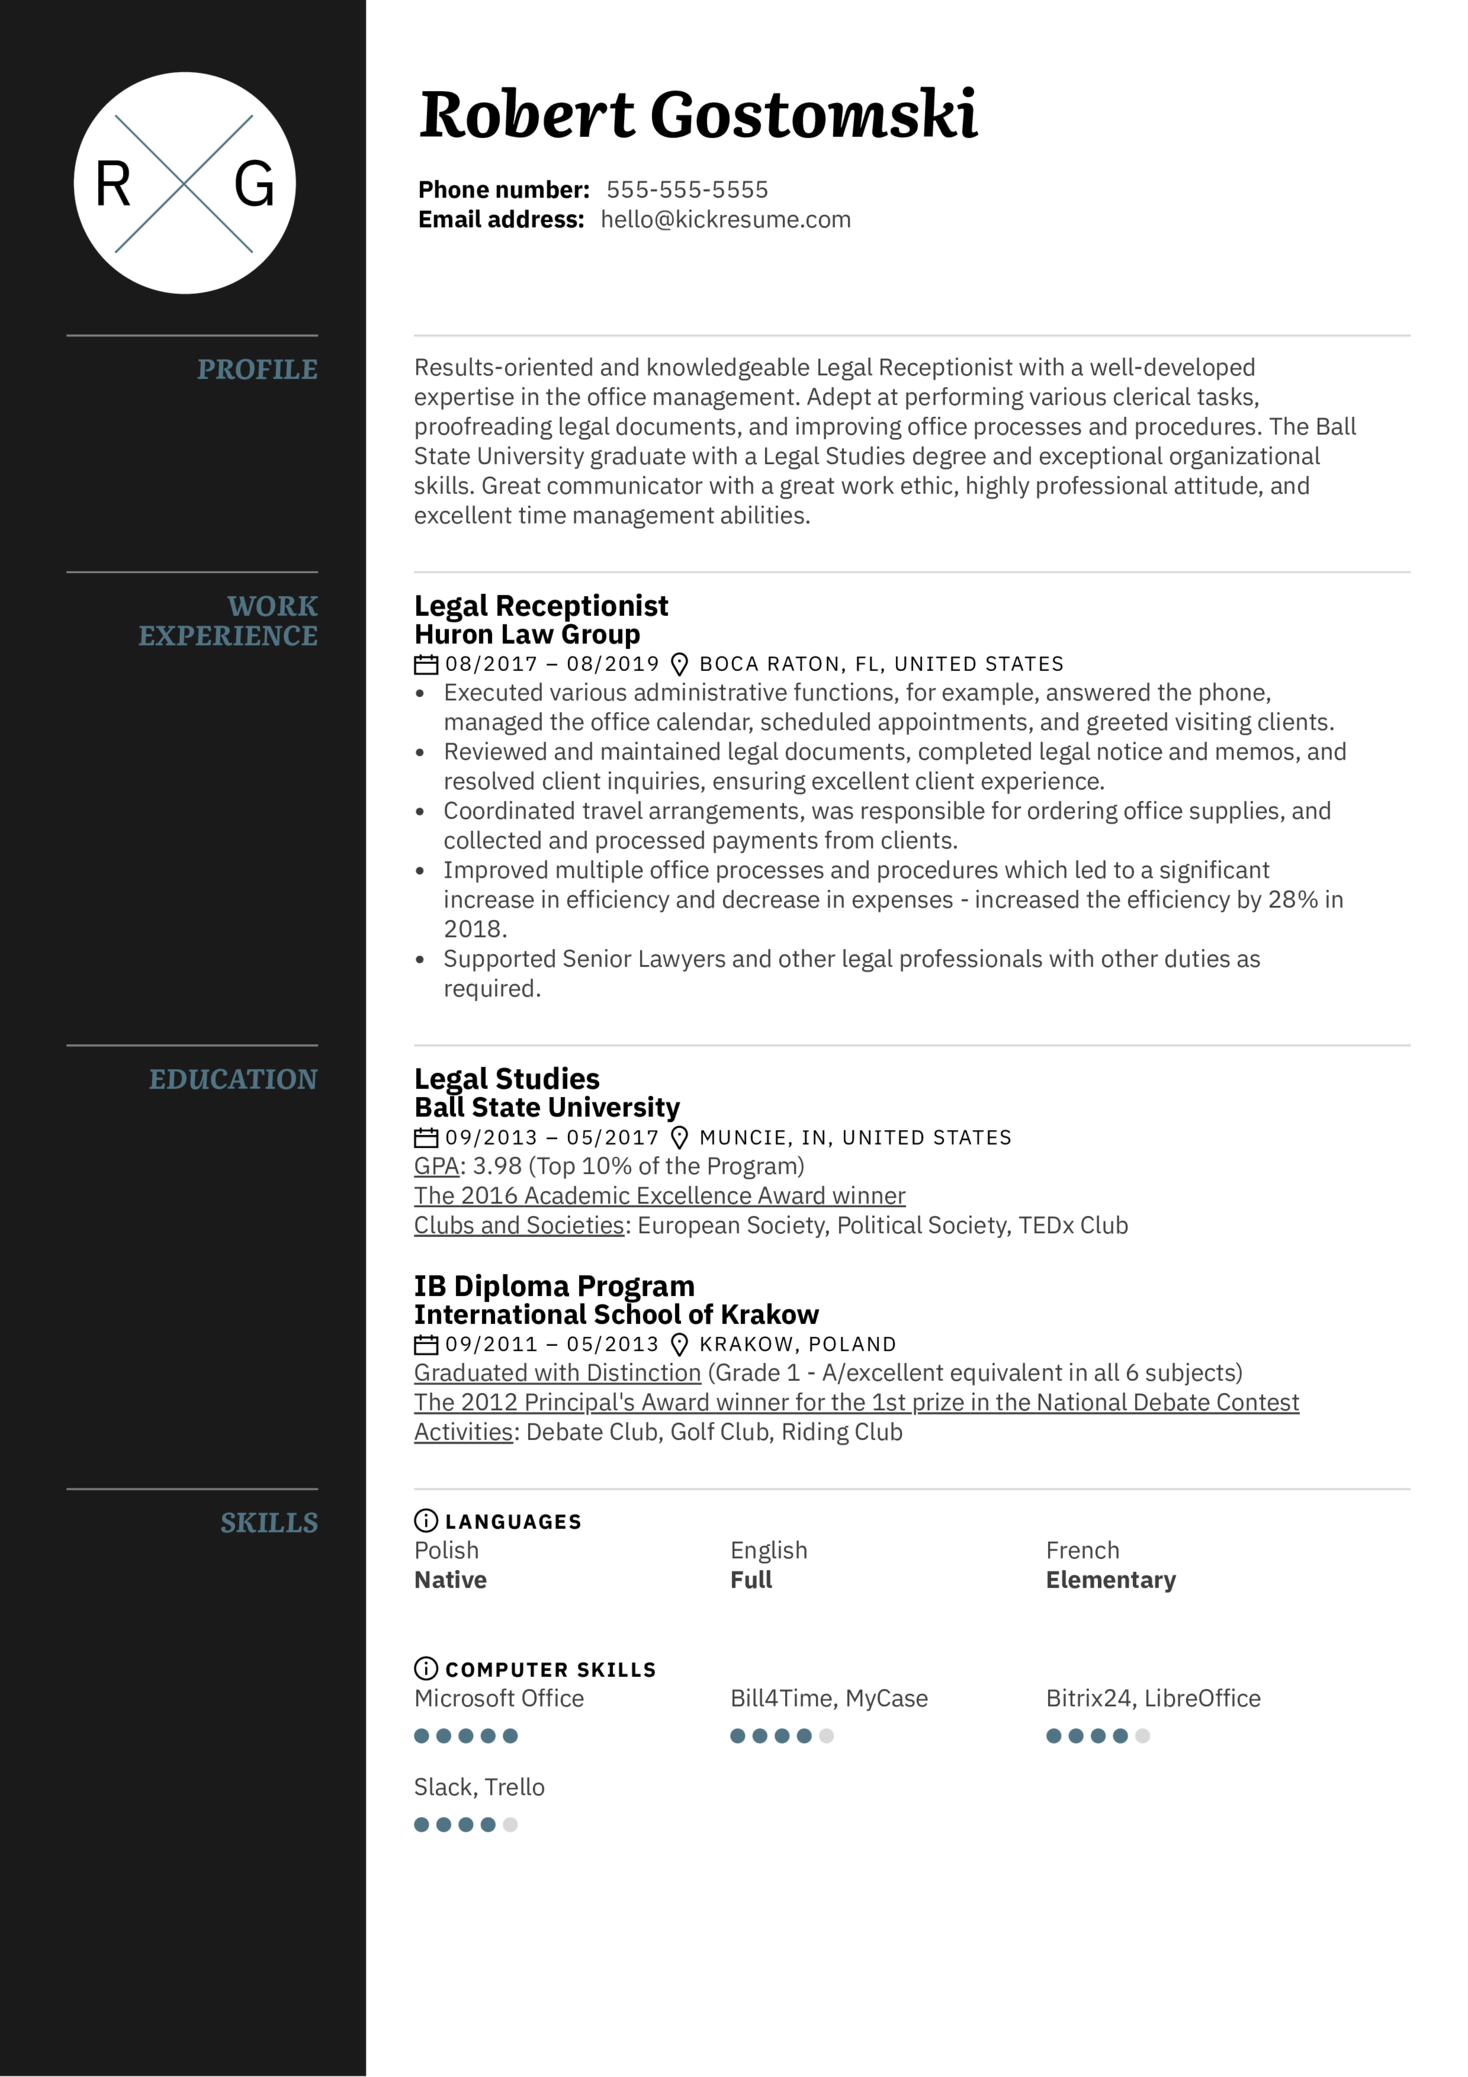 Legal Receptionist Resume Template (Teil 1)